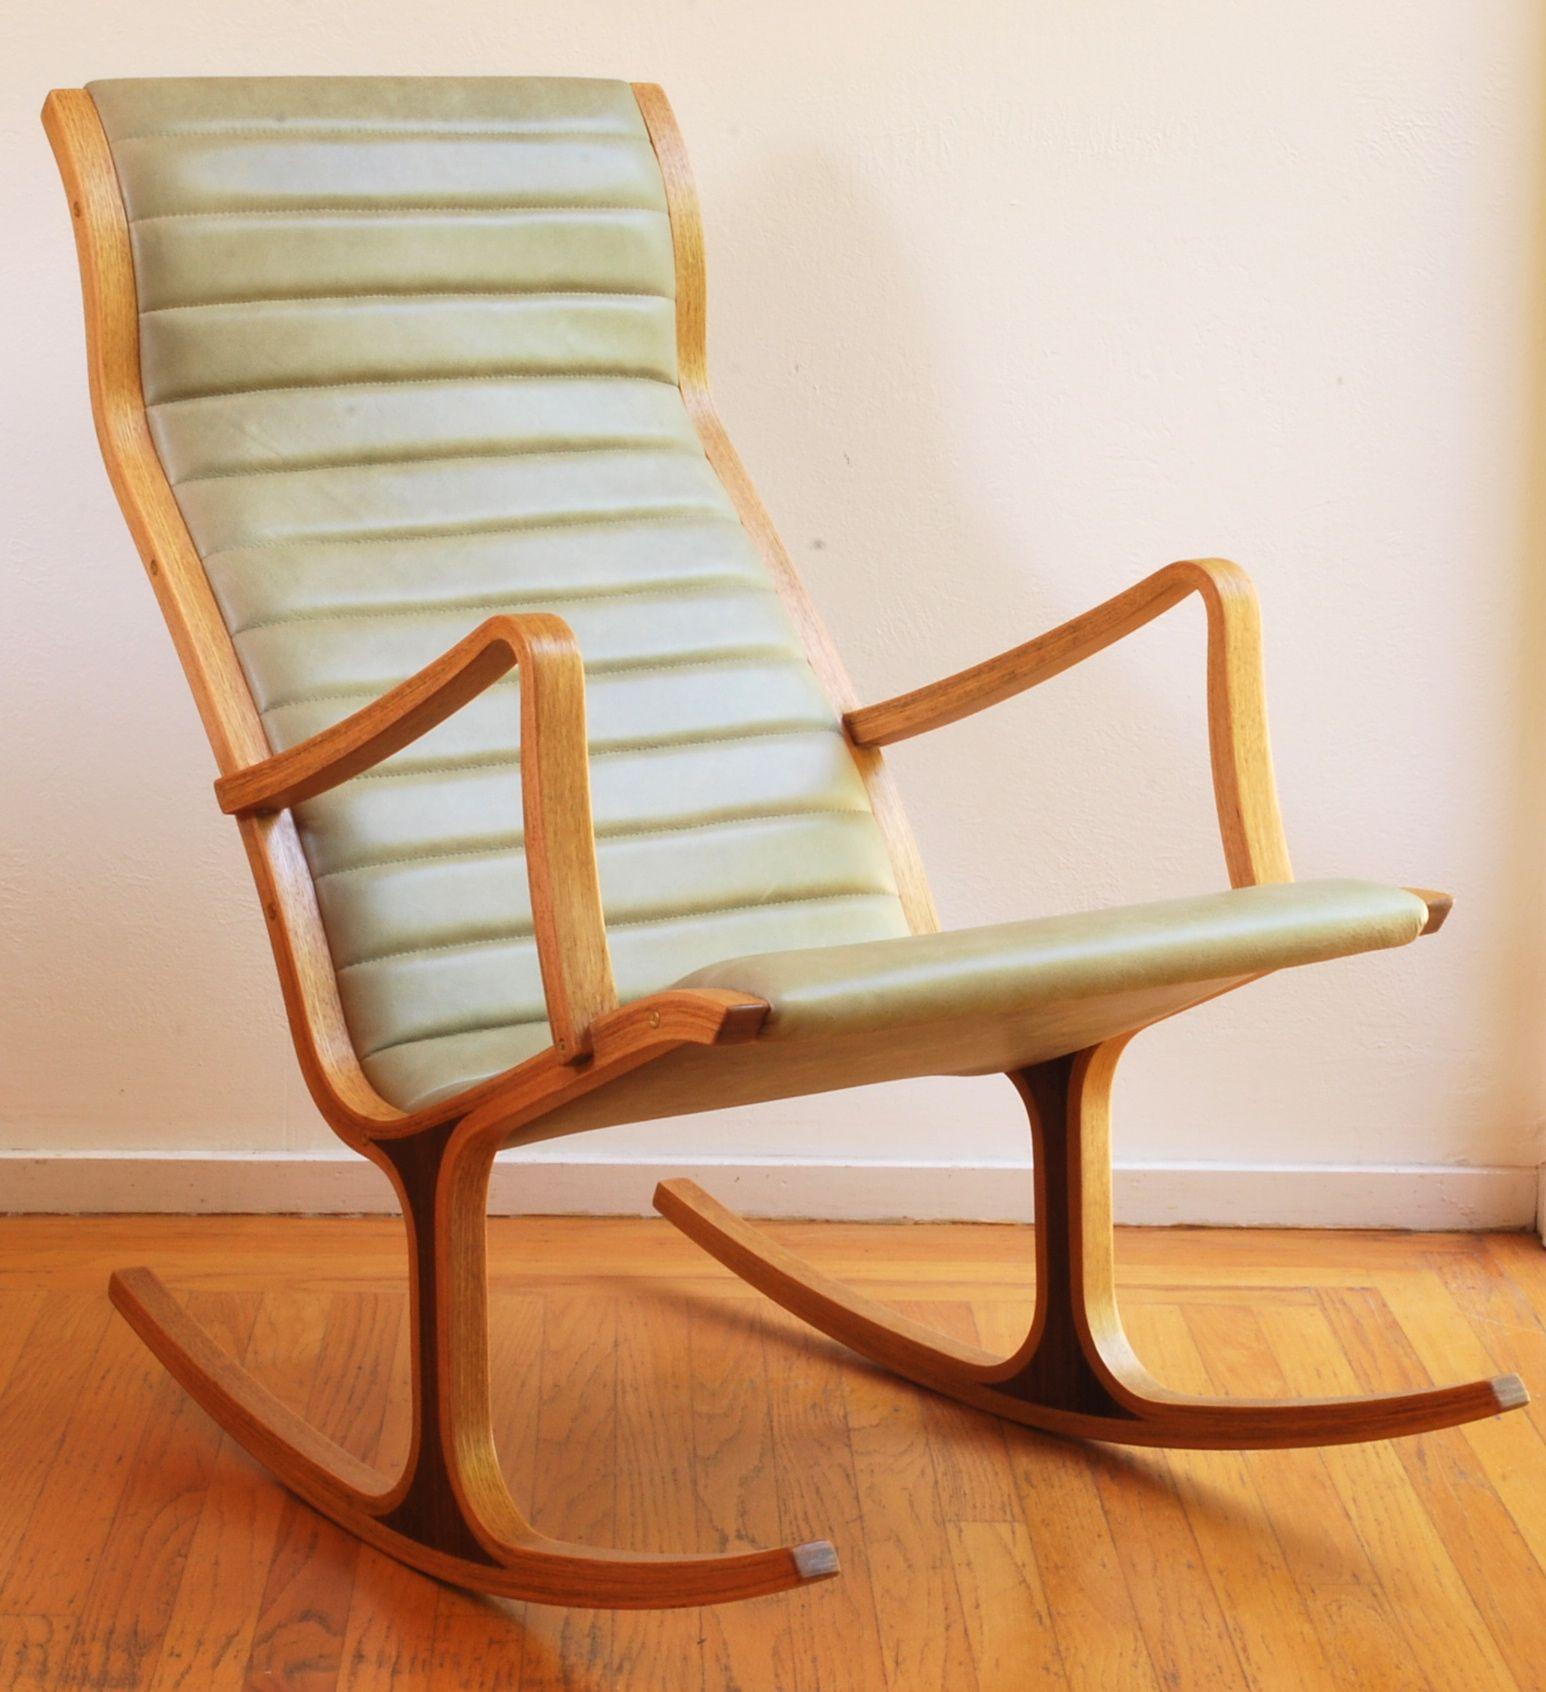 Tendo Mokko Heron rocking chair following reupholstery in semi